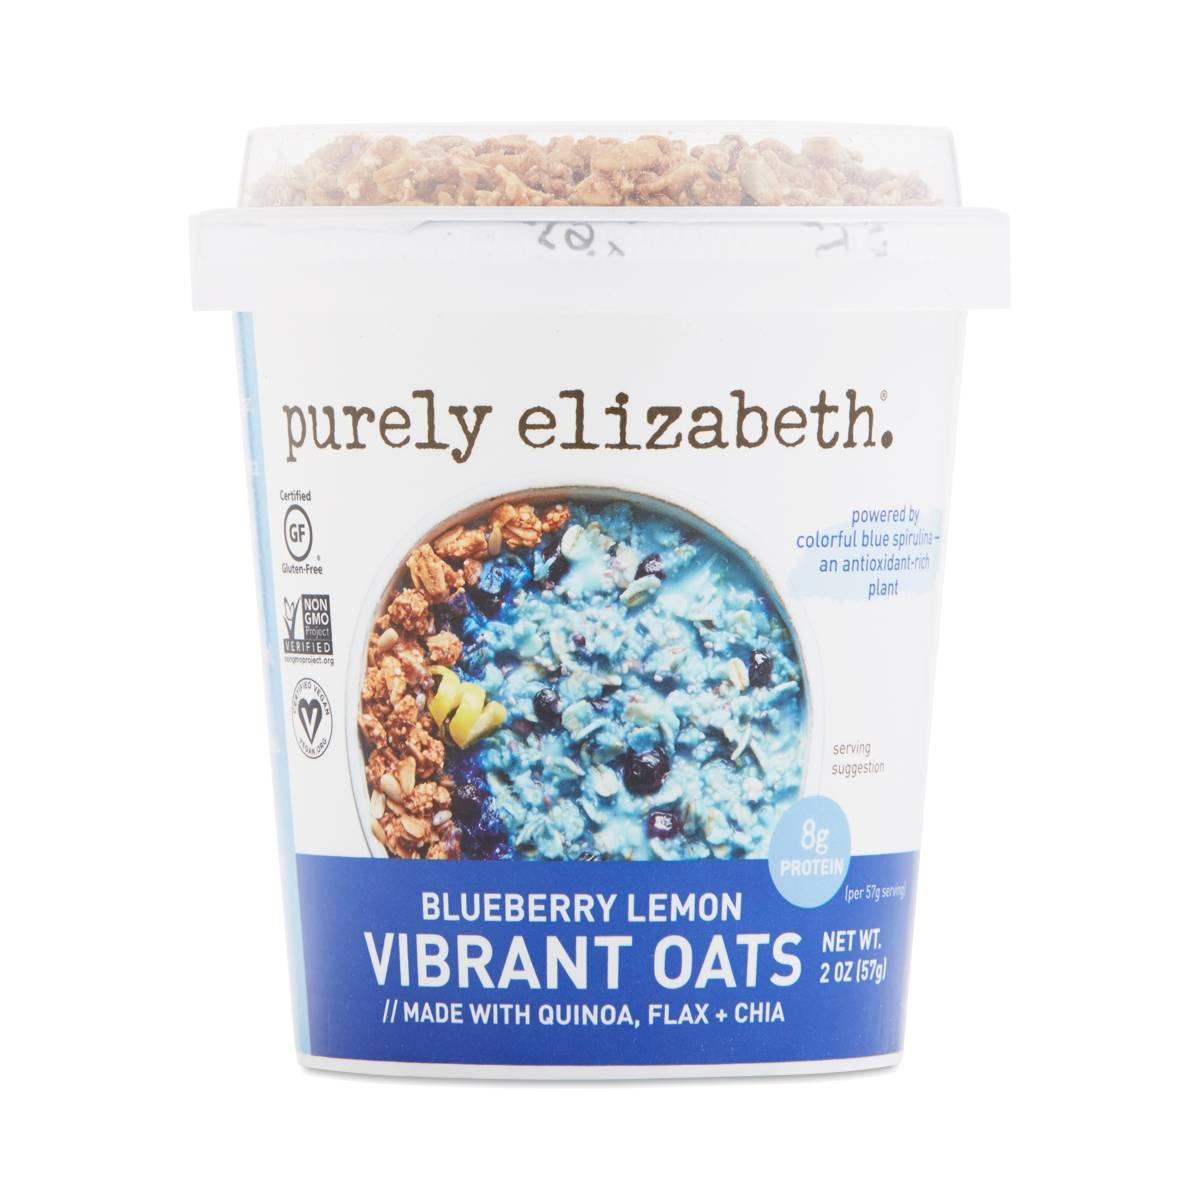 Purely Elizabeth Vibrant Oats Cup, Blueberry Lemon - Thrive Market